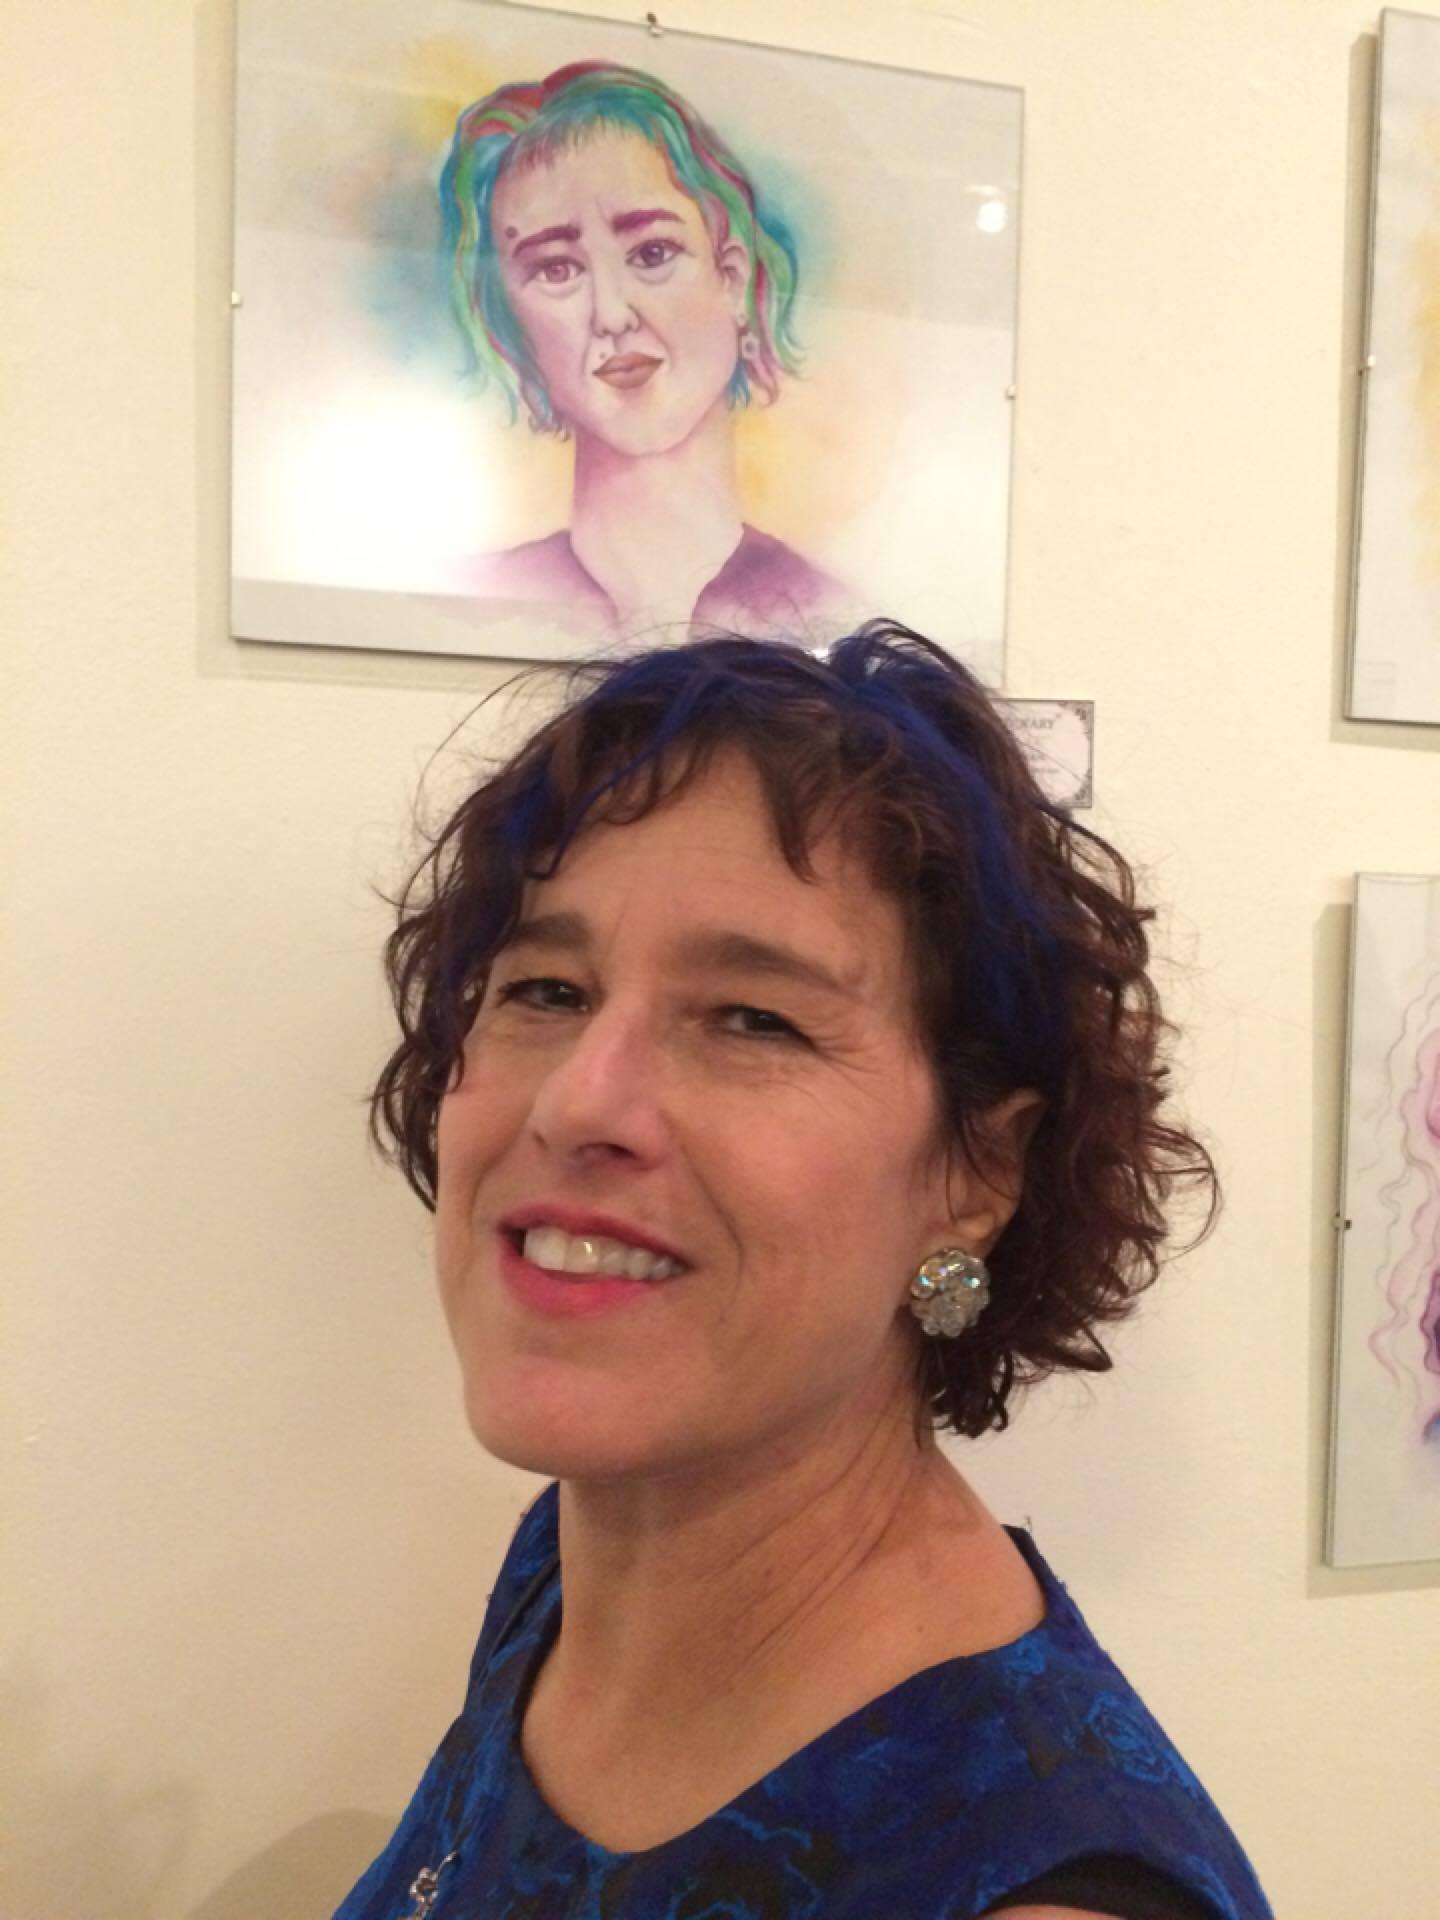 Miki Berman in front of her self-portrait